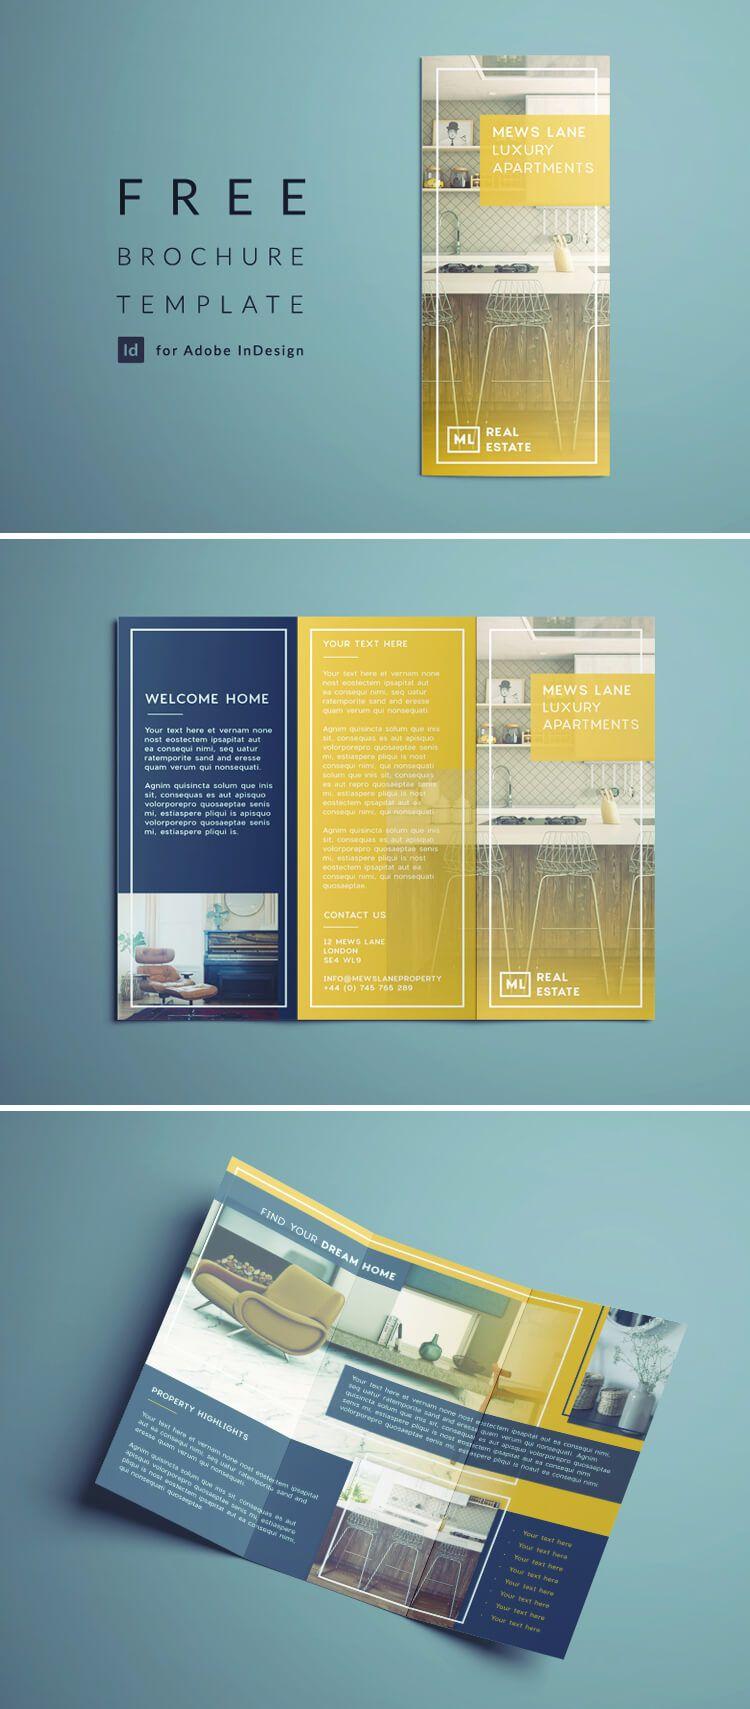 Tri Fold Brochure Free Indesign Template Free Brochure Template Indesign Templates Free Trifold Brochure Template Indesign 3 fold brochure template